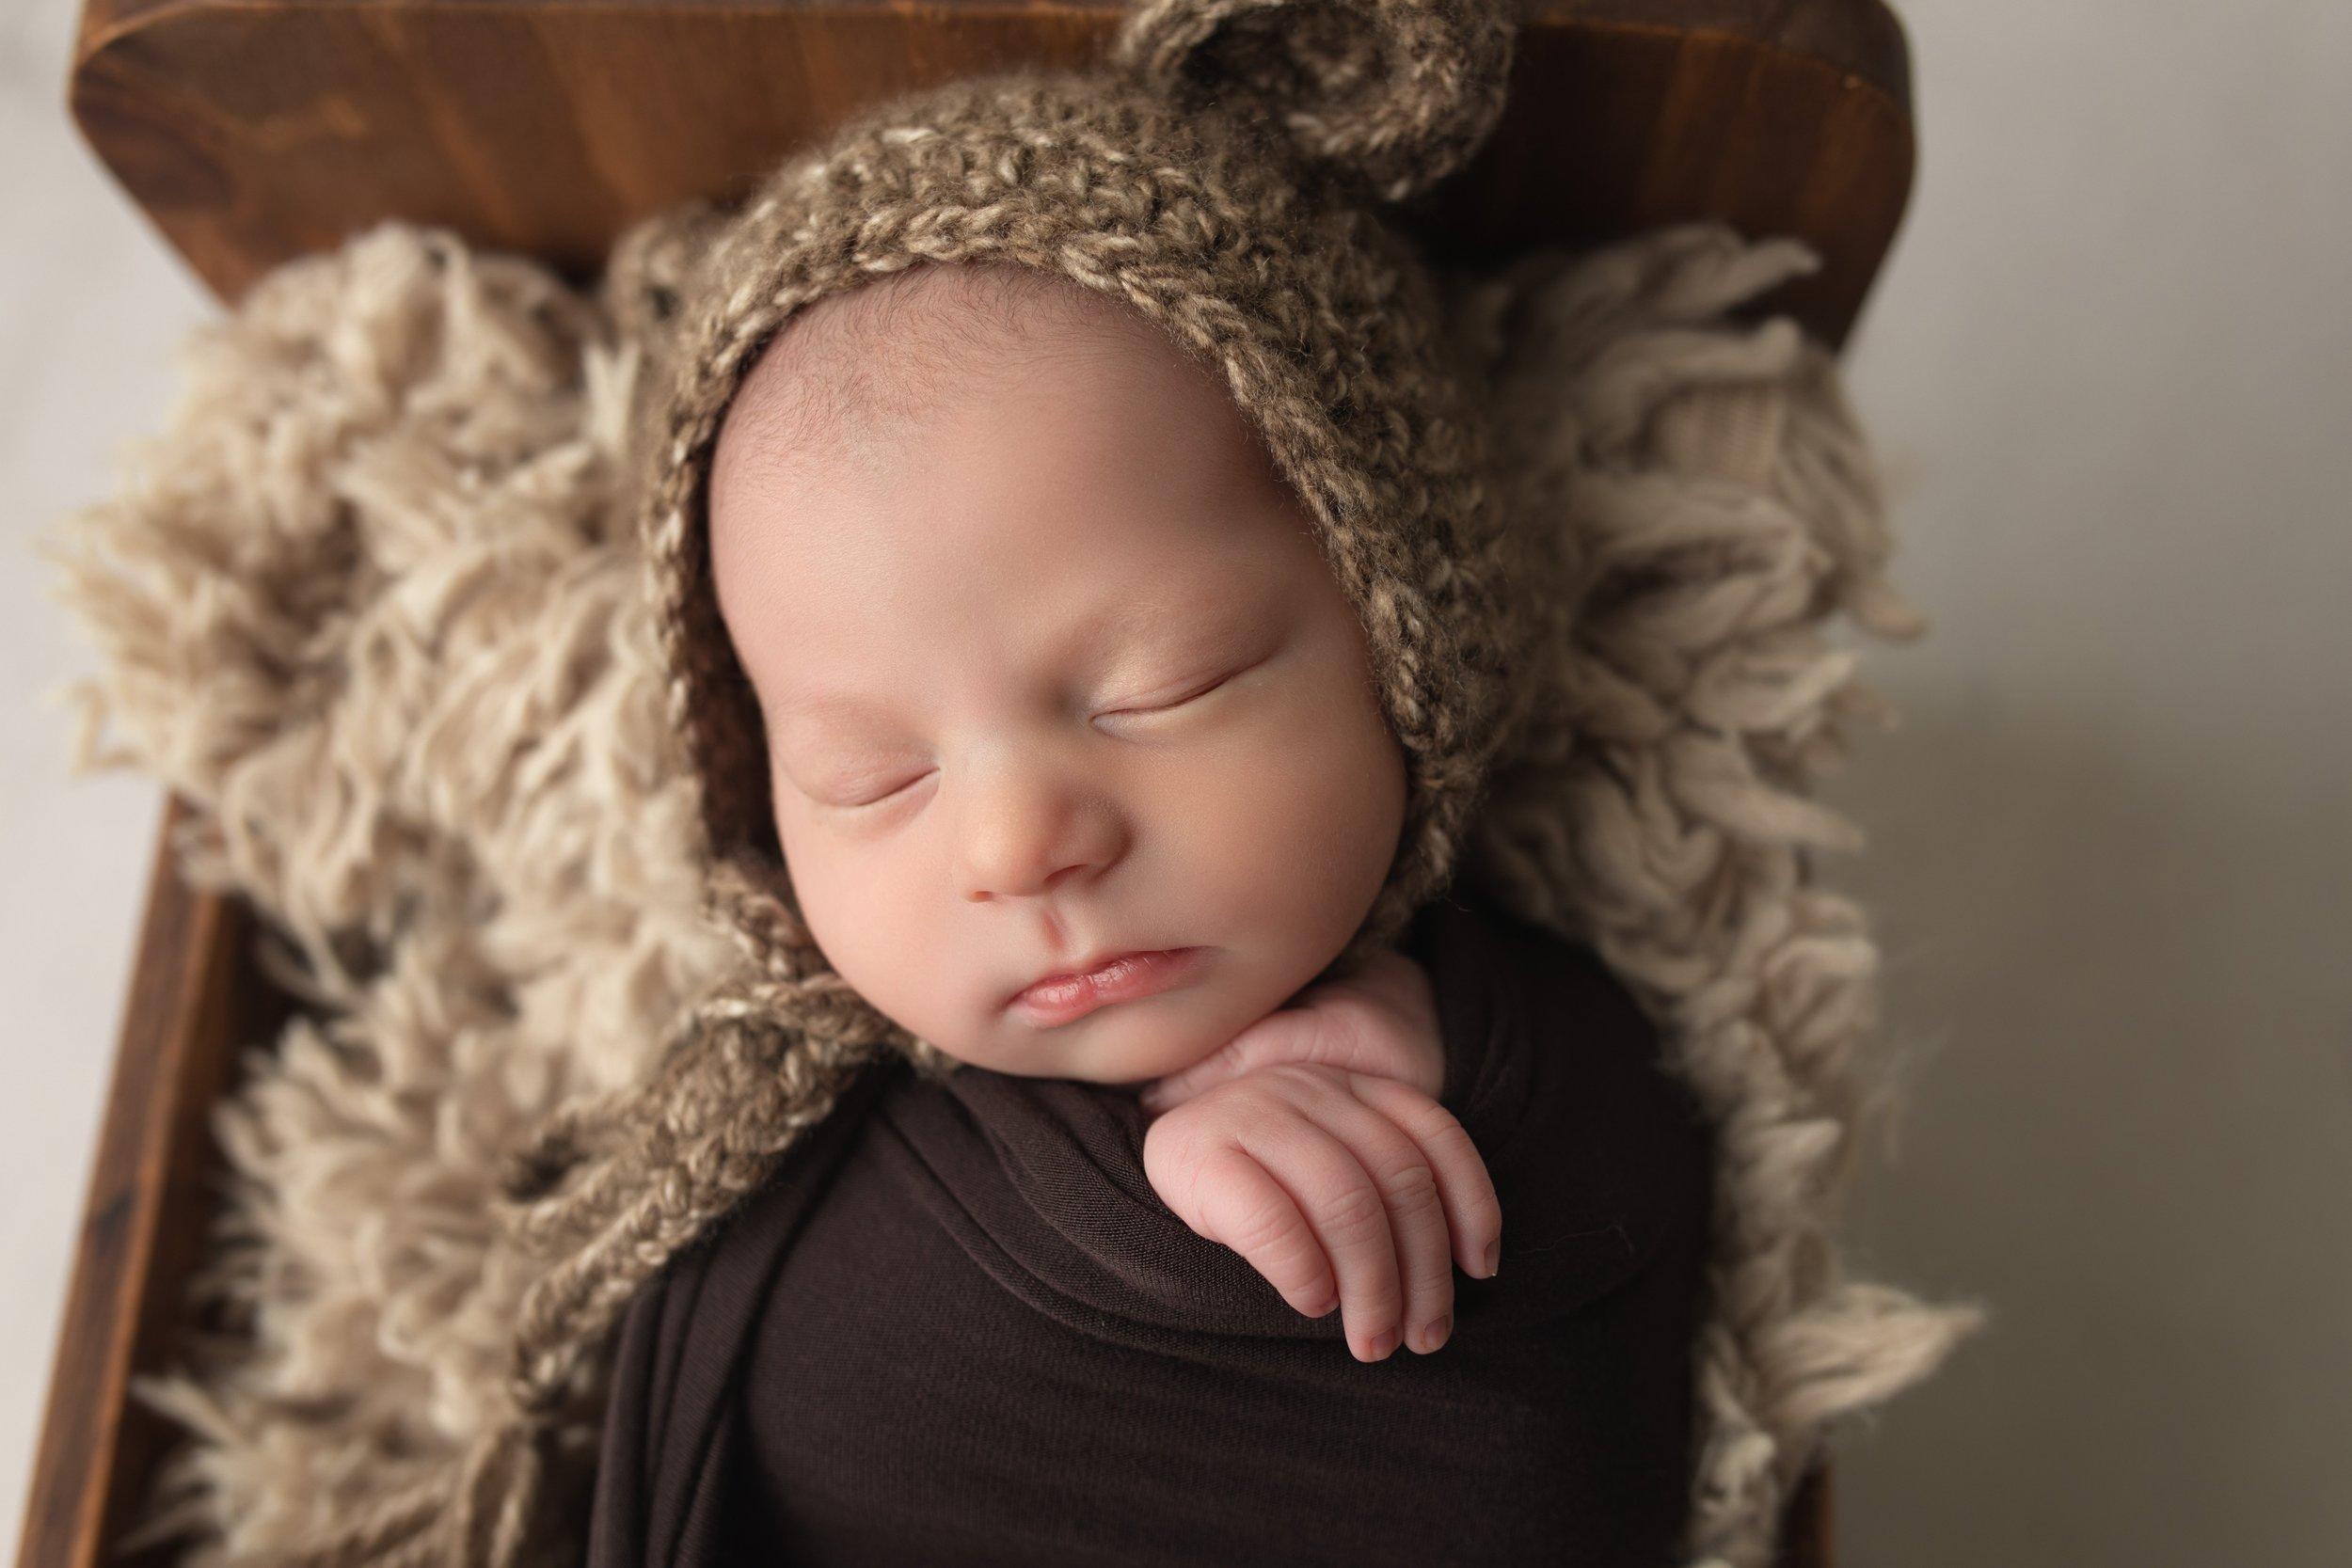 russellville-ar-newborn-photographer.jpg